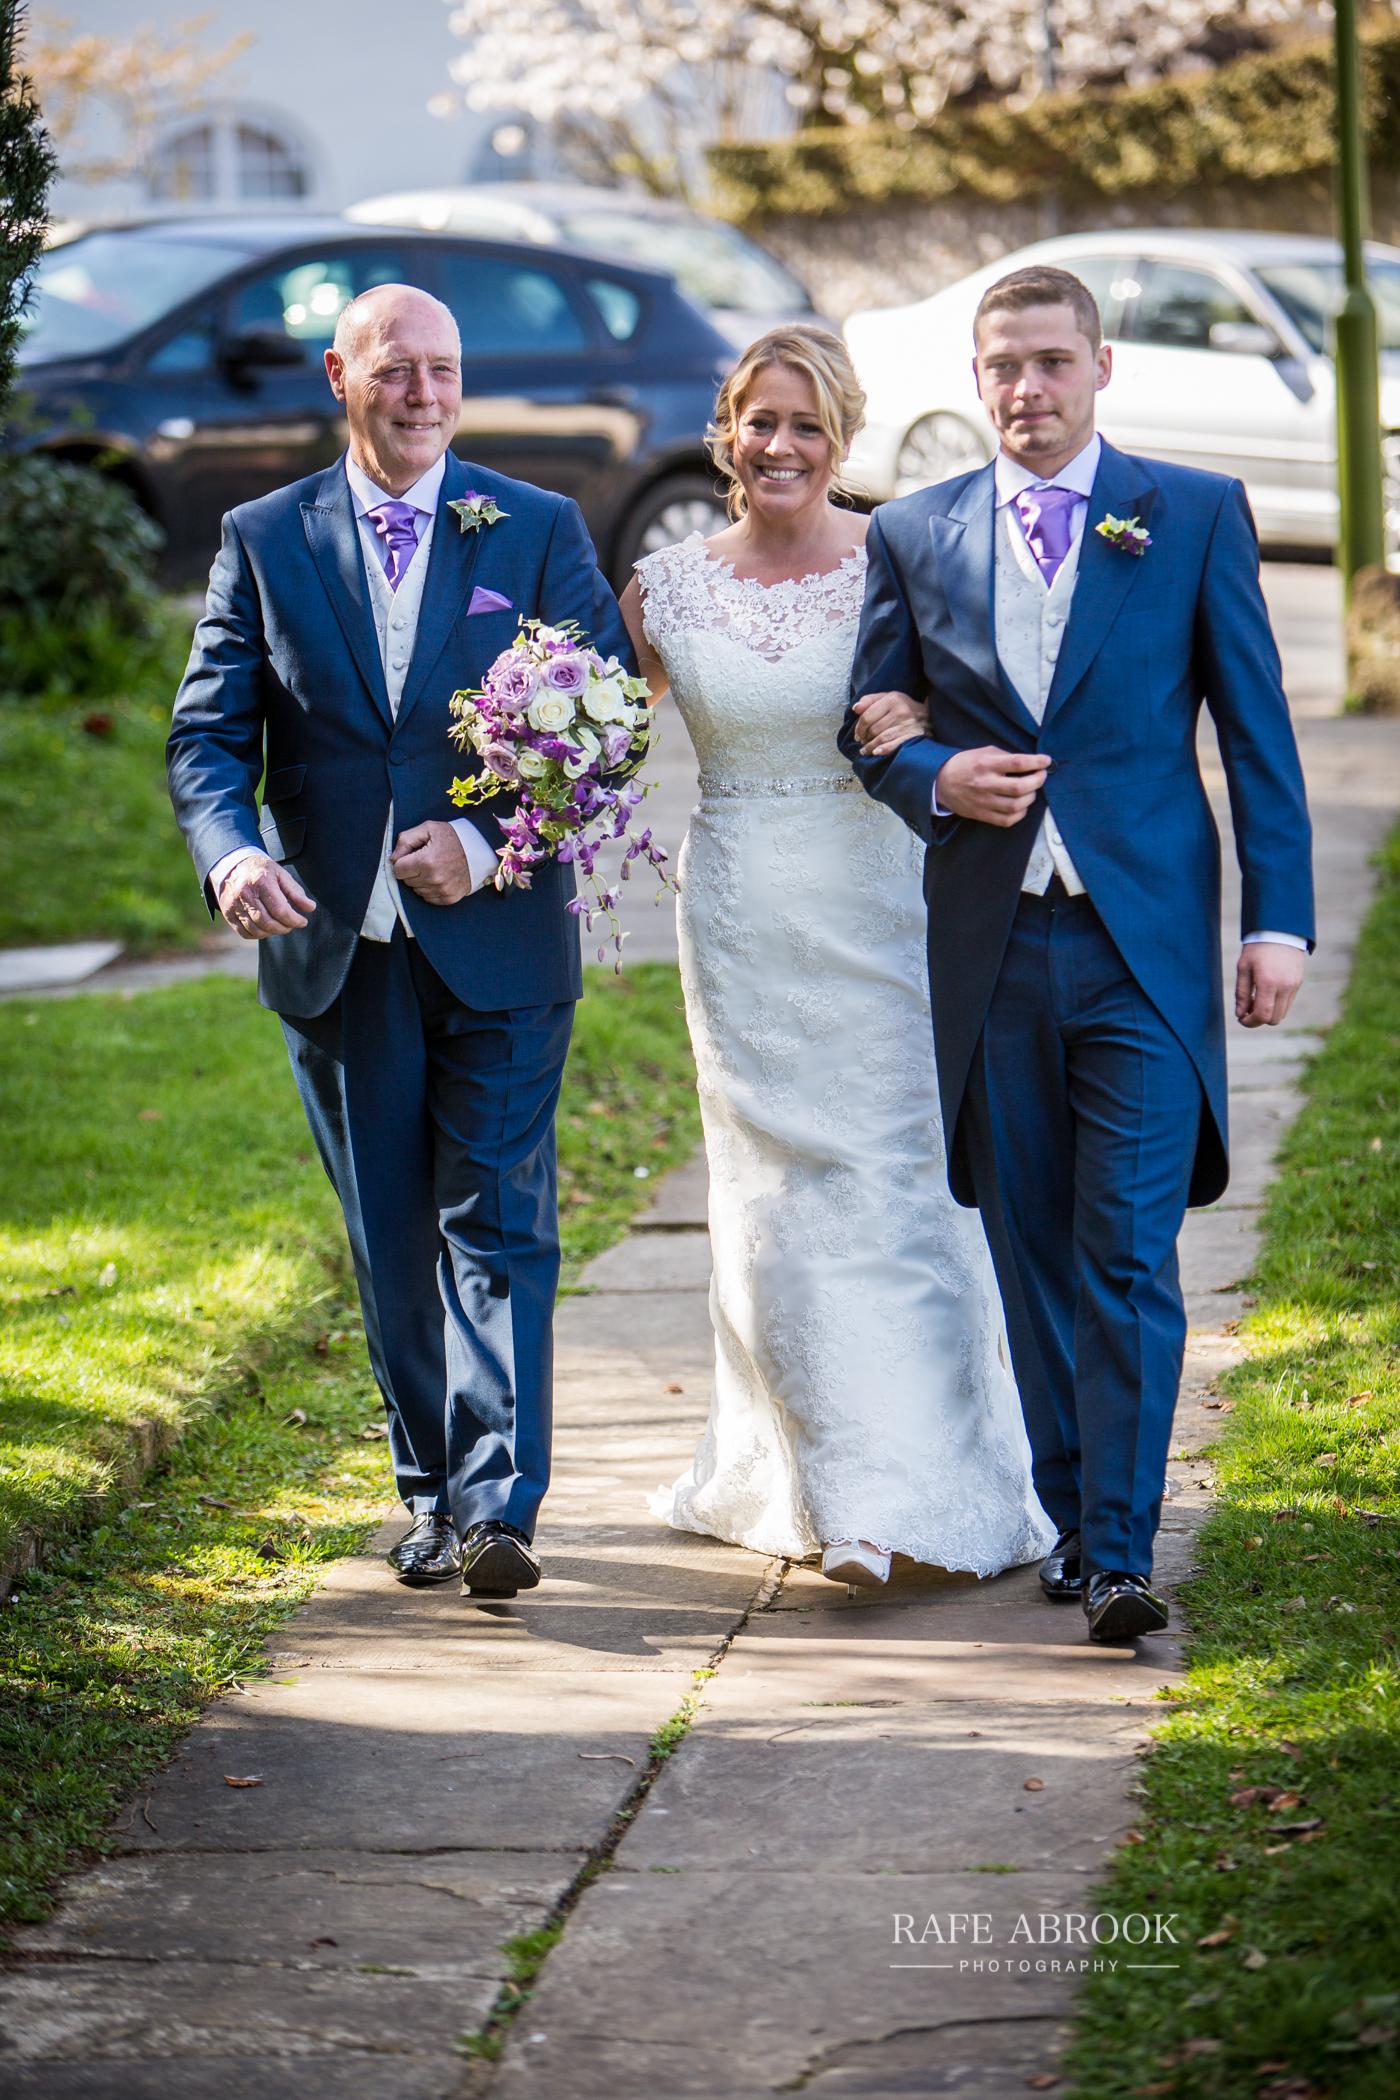 louise & john wedding all saints church kings langley-600.jpg